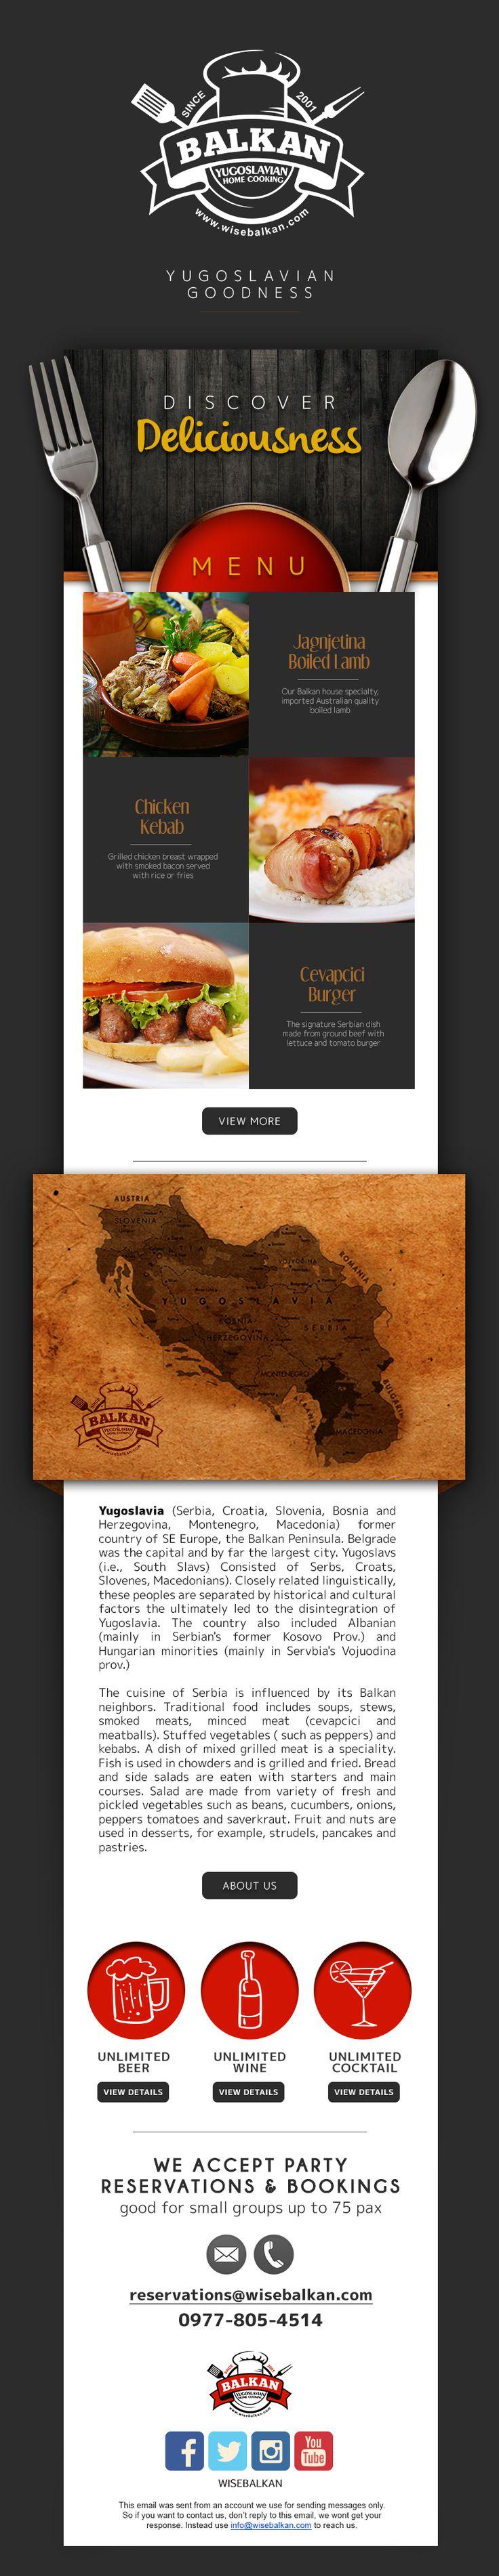 Discover  the Yugoslavian Goodness.